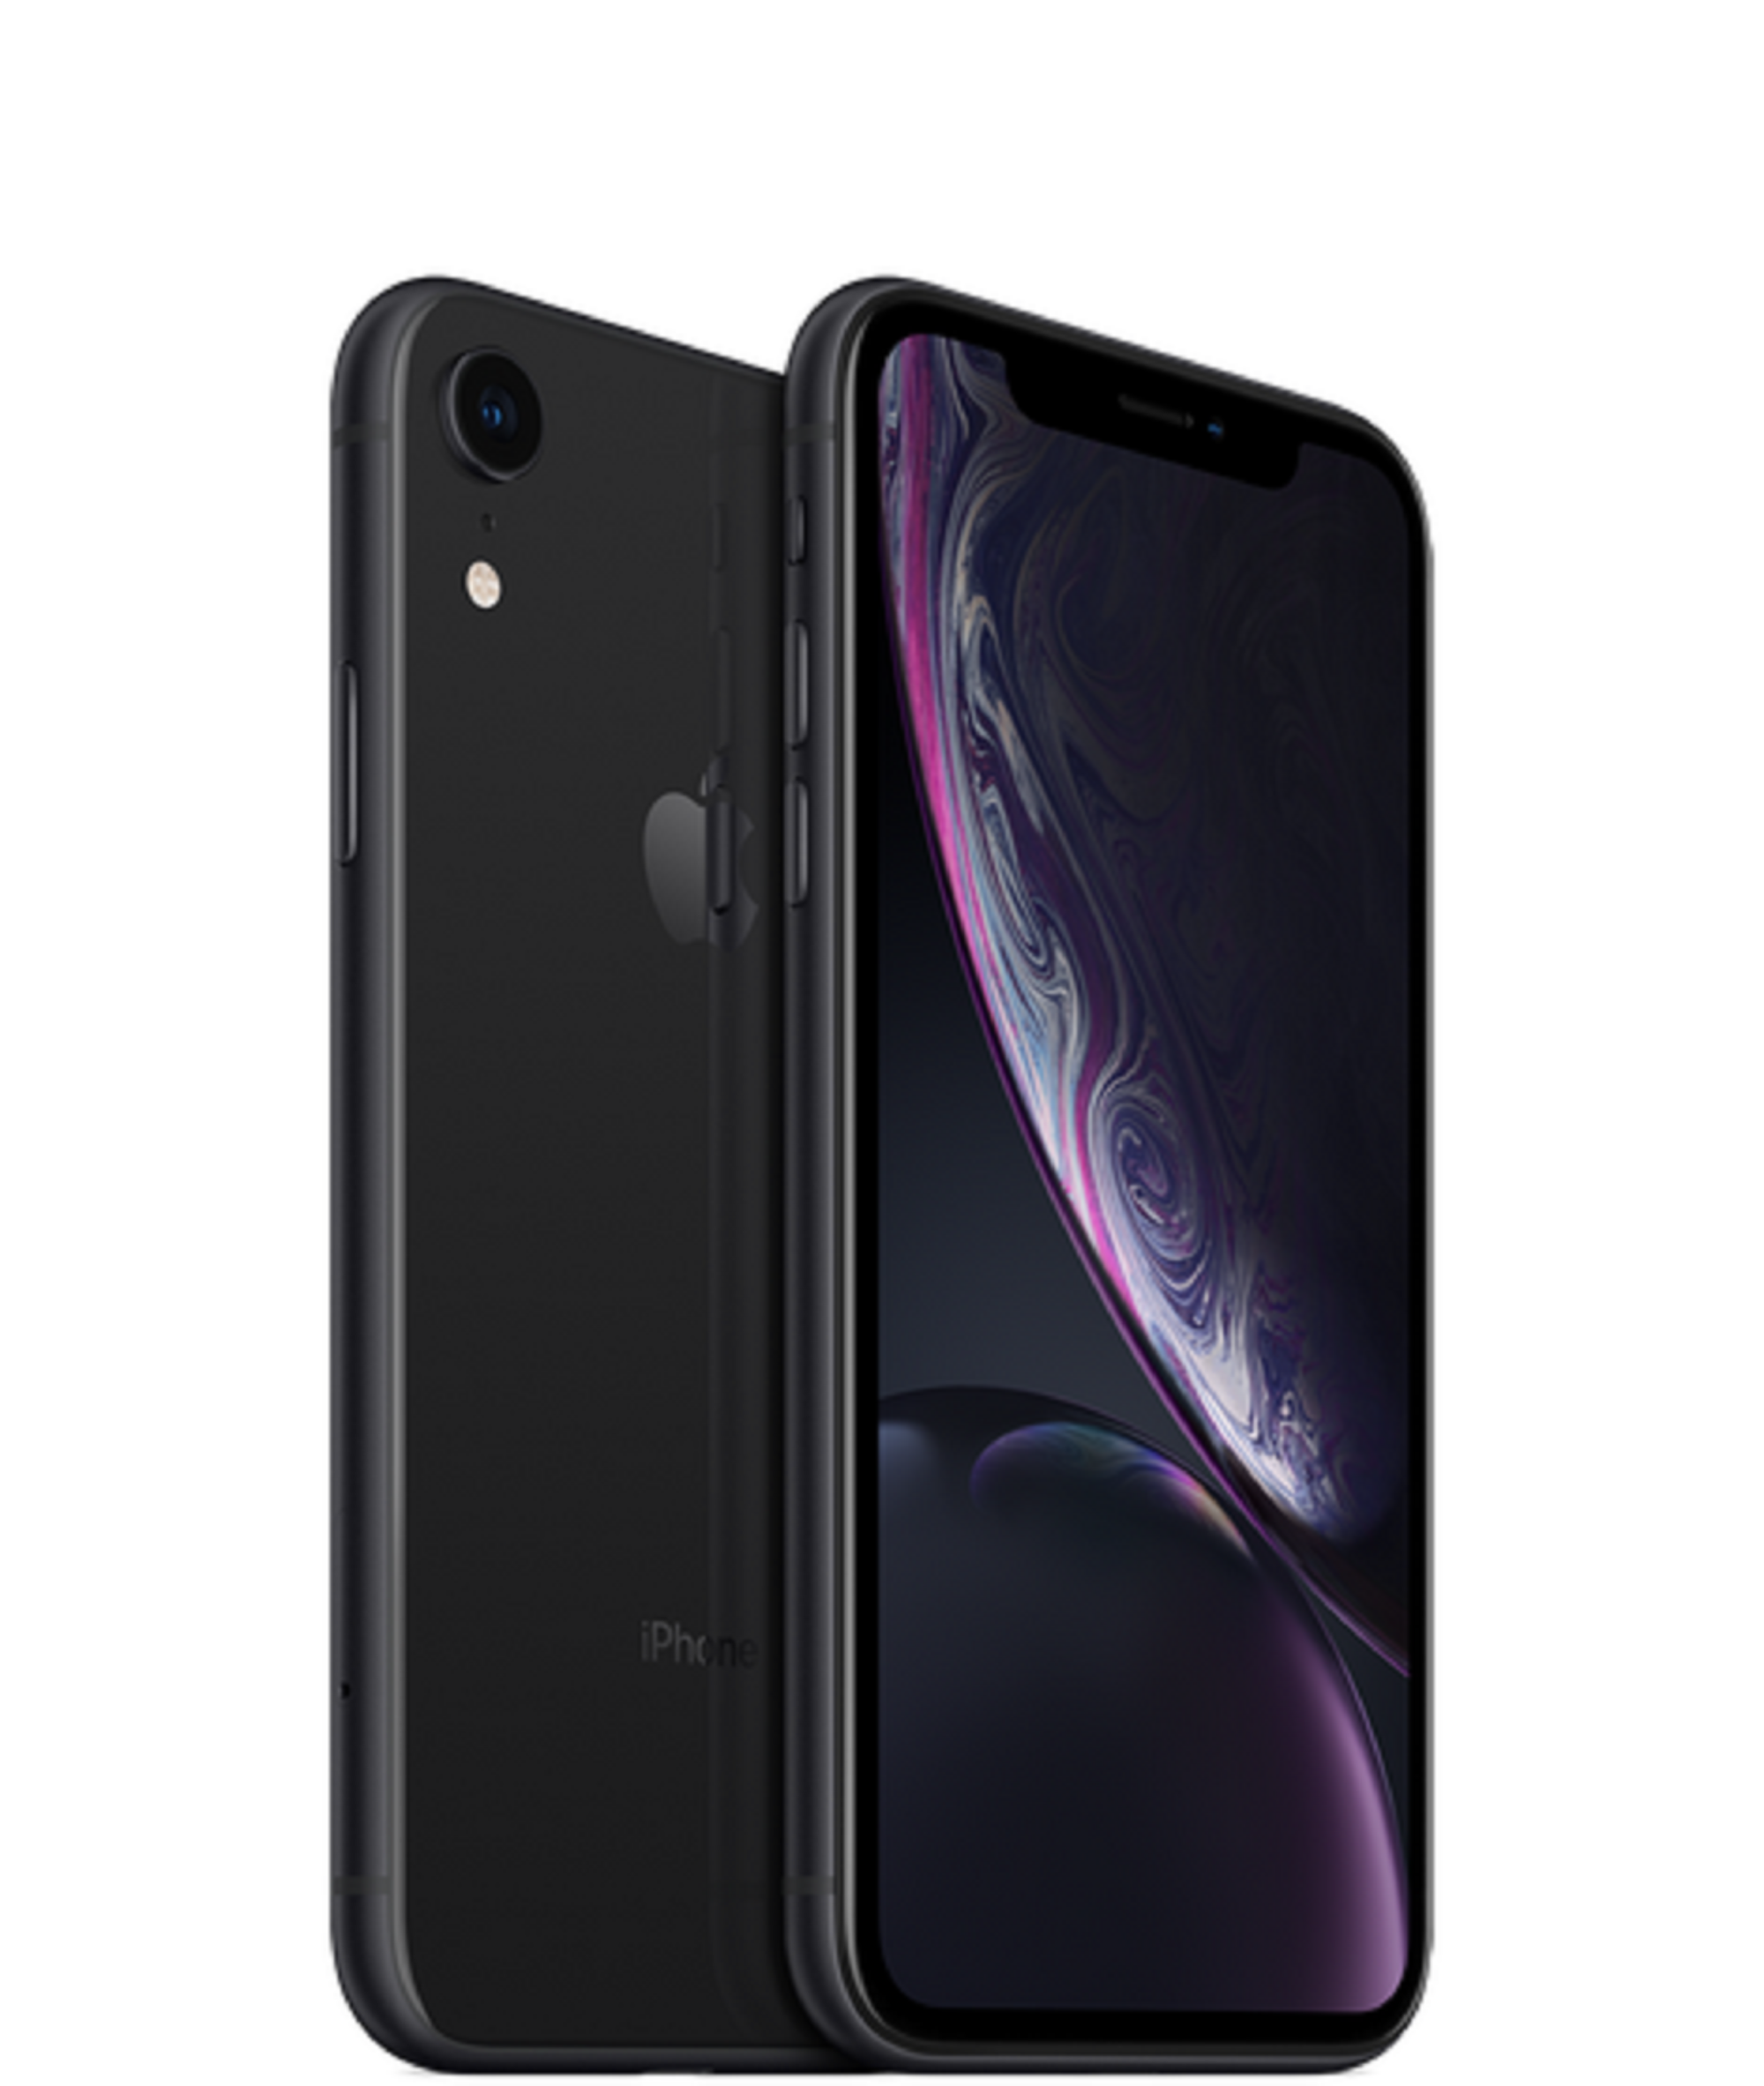 thumbnail 6 - Apple iPhone XR 64GB Factory Unlocked Smartphone 4G LTE iOS Smartphone